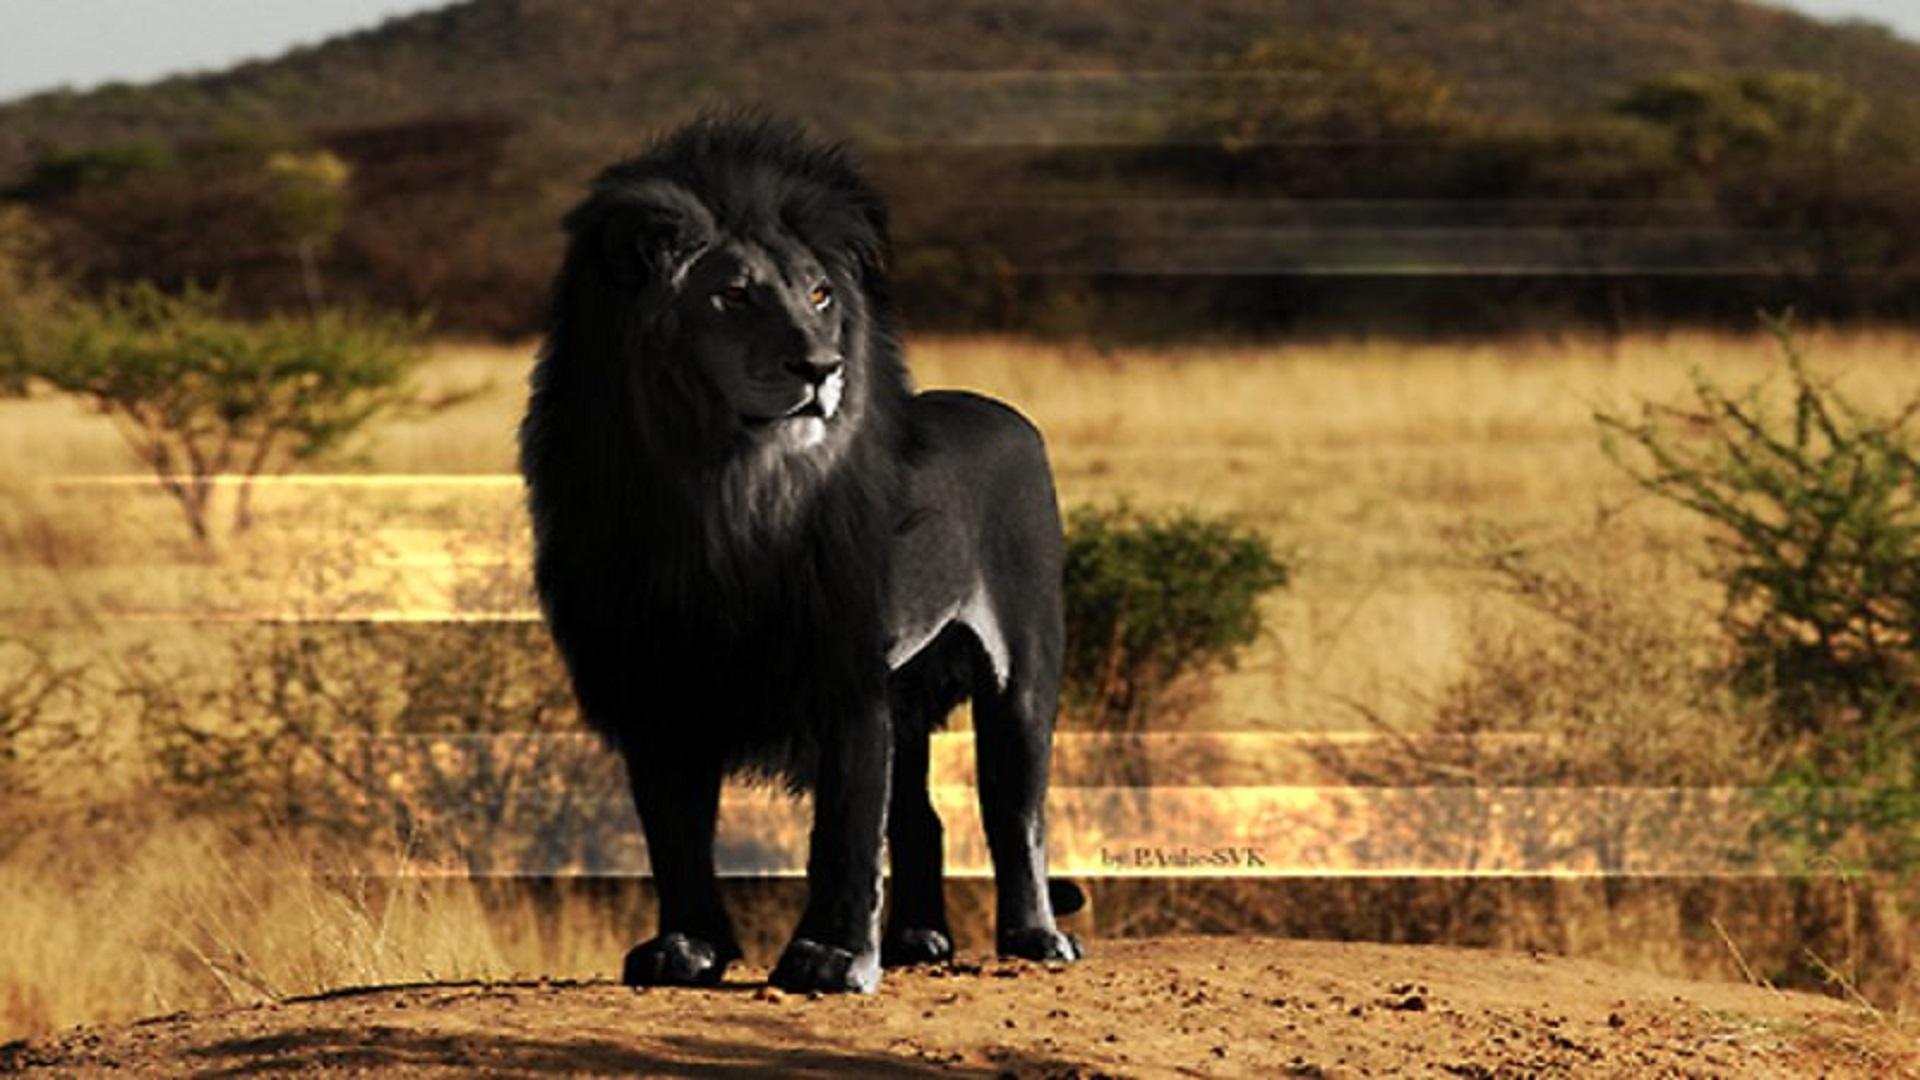 Black African Lion Hd Free Wallpapers For Desktop Hd Wallpaper